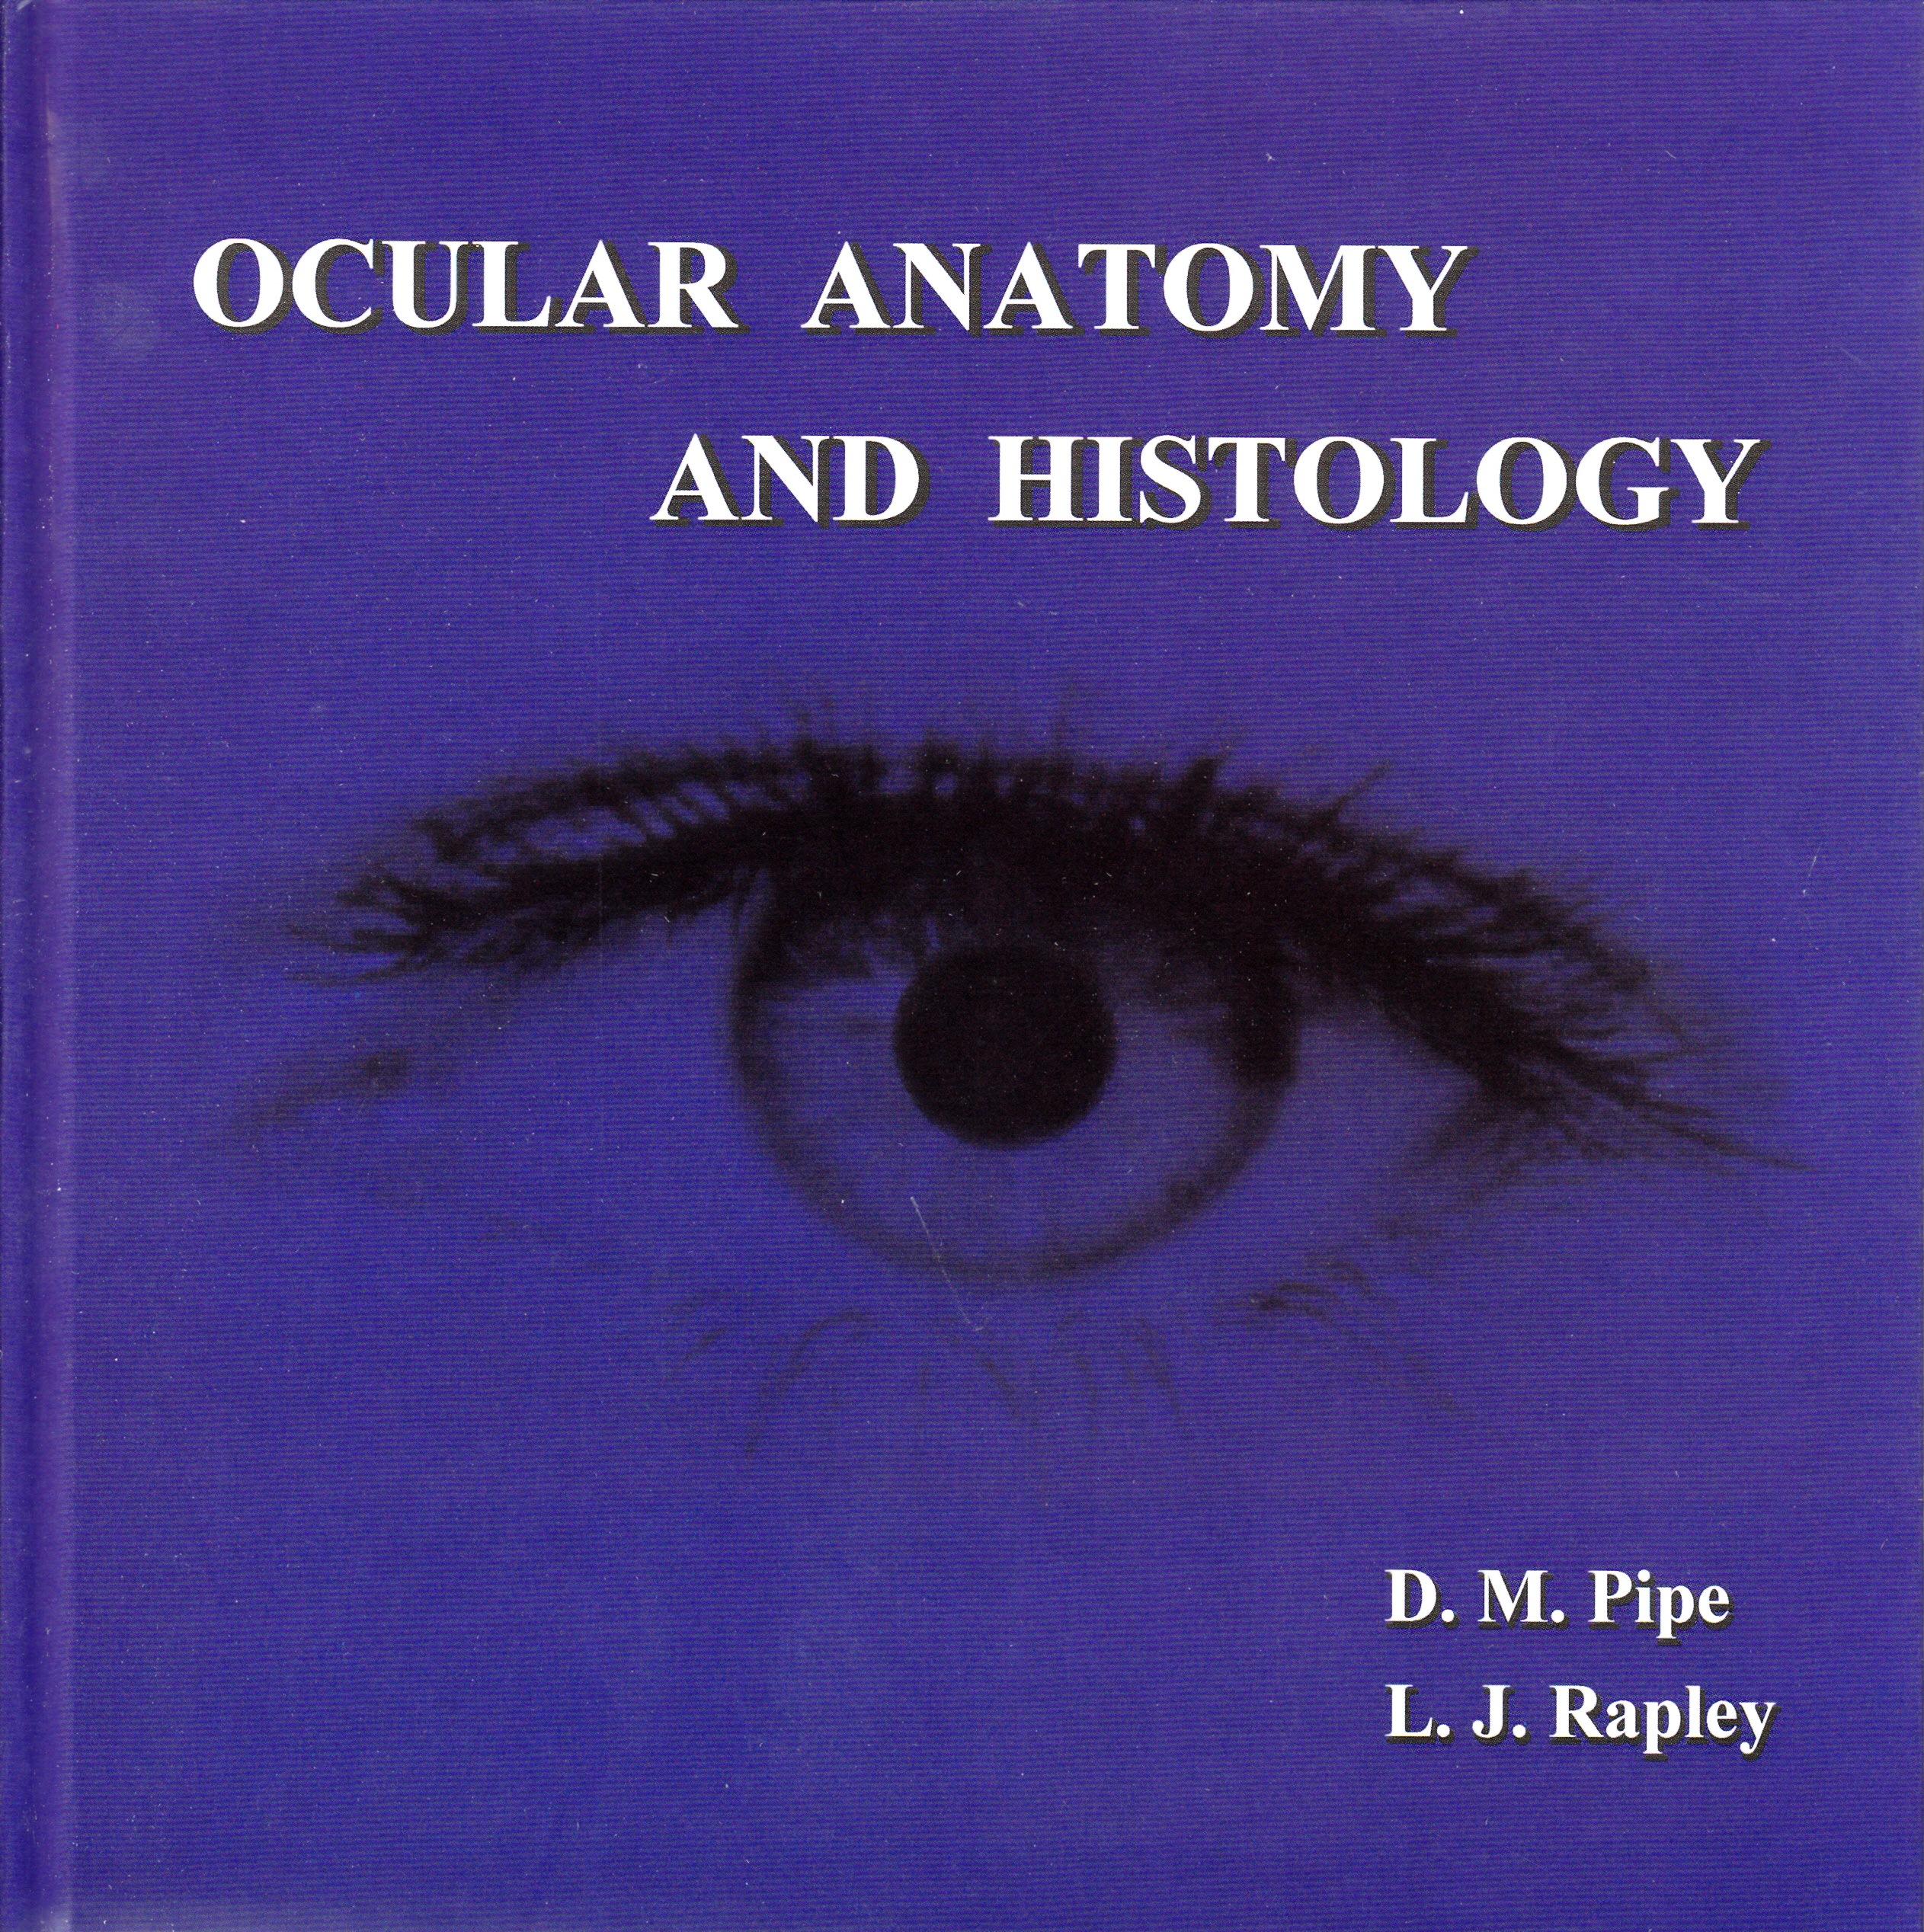 Ocular Anatomy & Histology